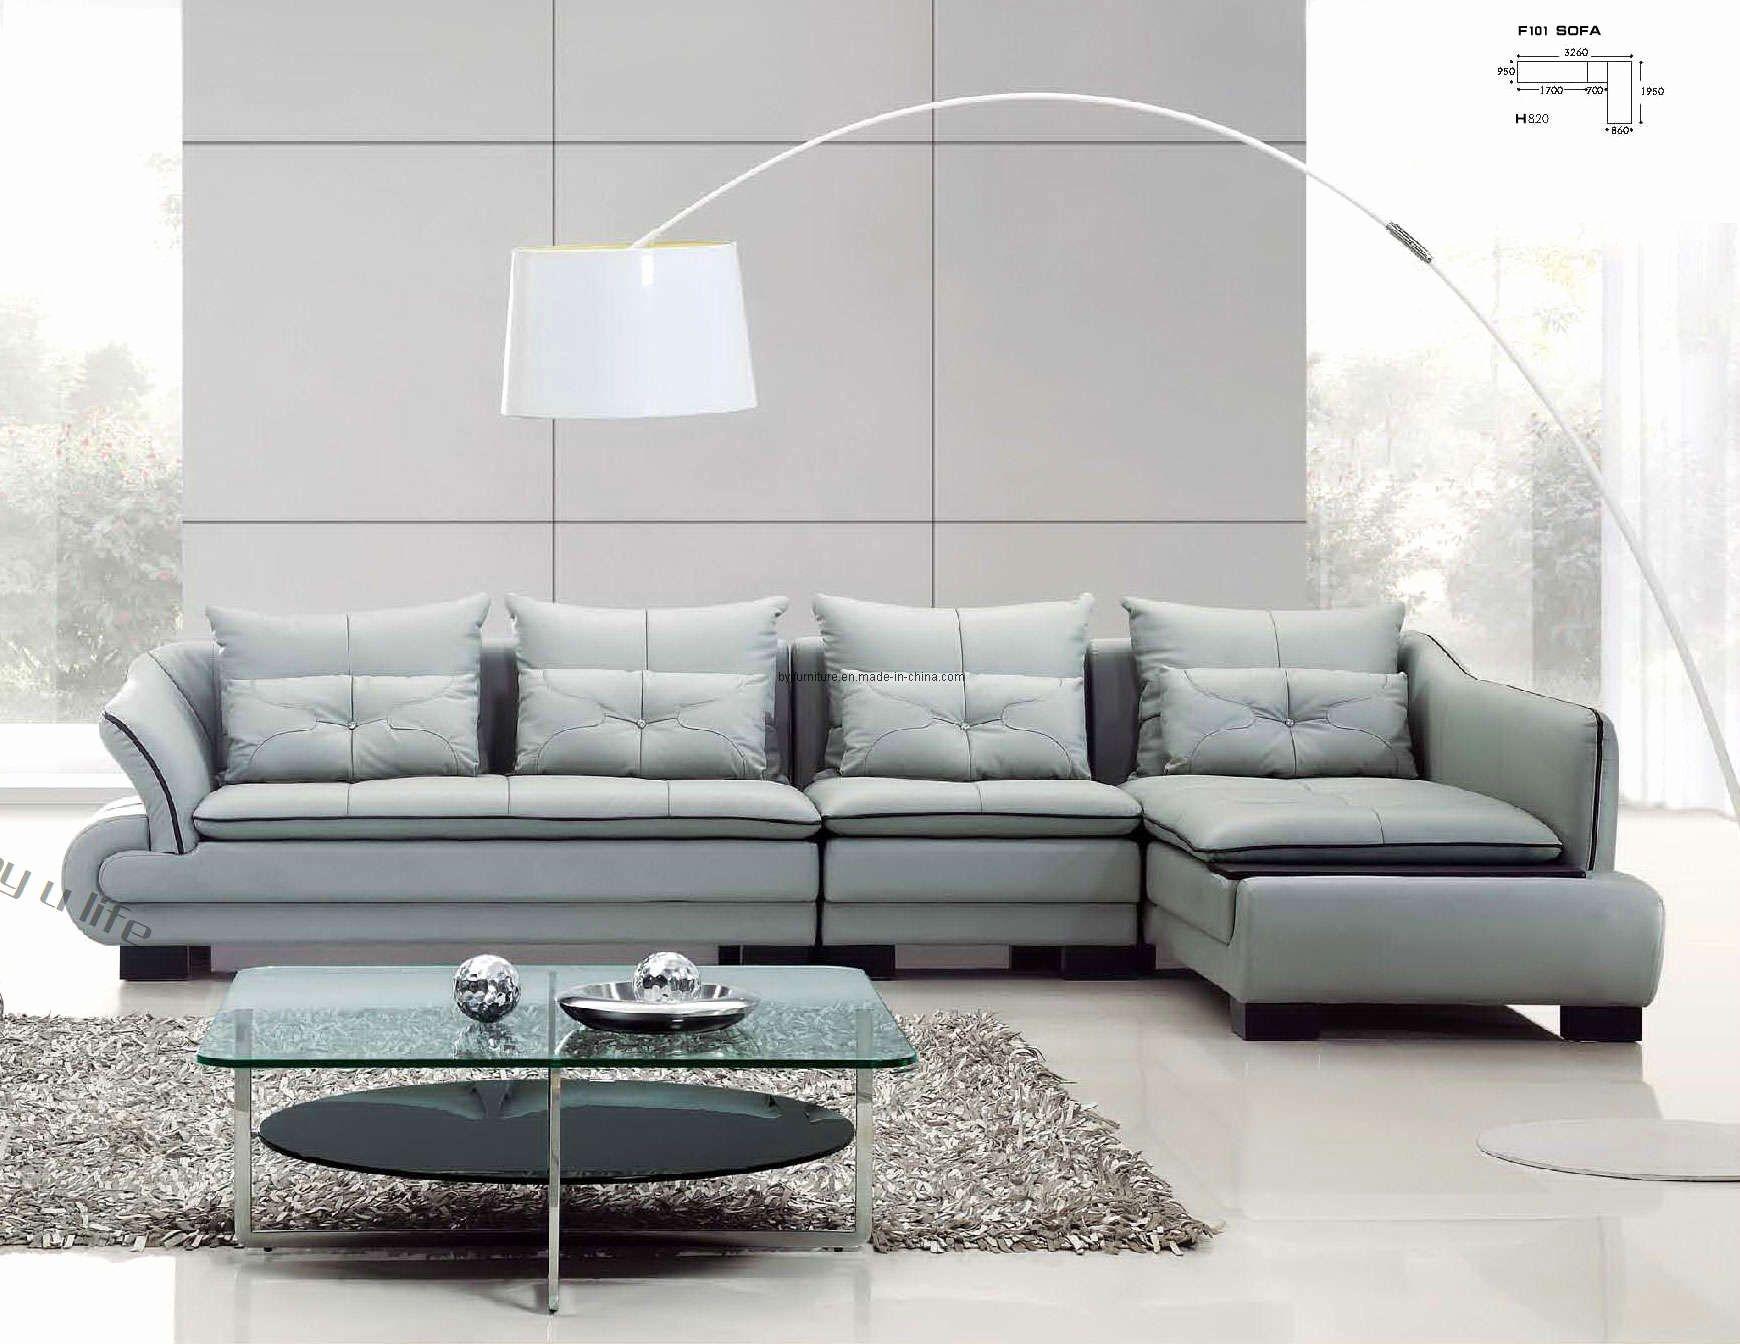 Amazing Modern White Sofas Pics Modern White Sofas Inspirational Sofa Modern White Sofa Set Modern White So Luxury Sofa Design Couch Design Latest Sofa Designs